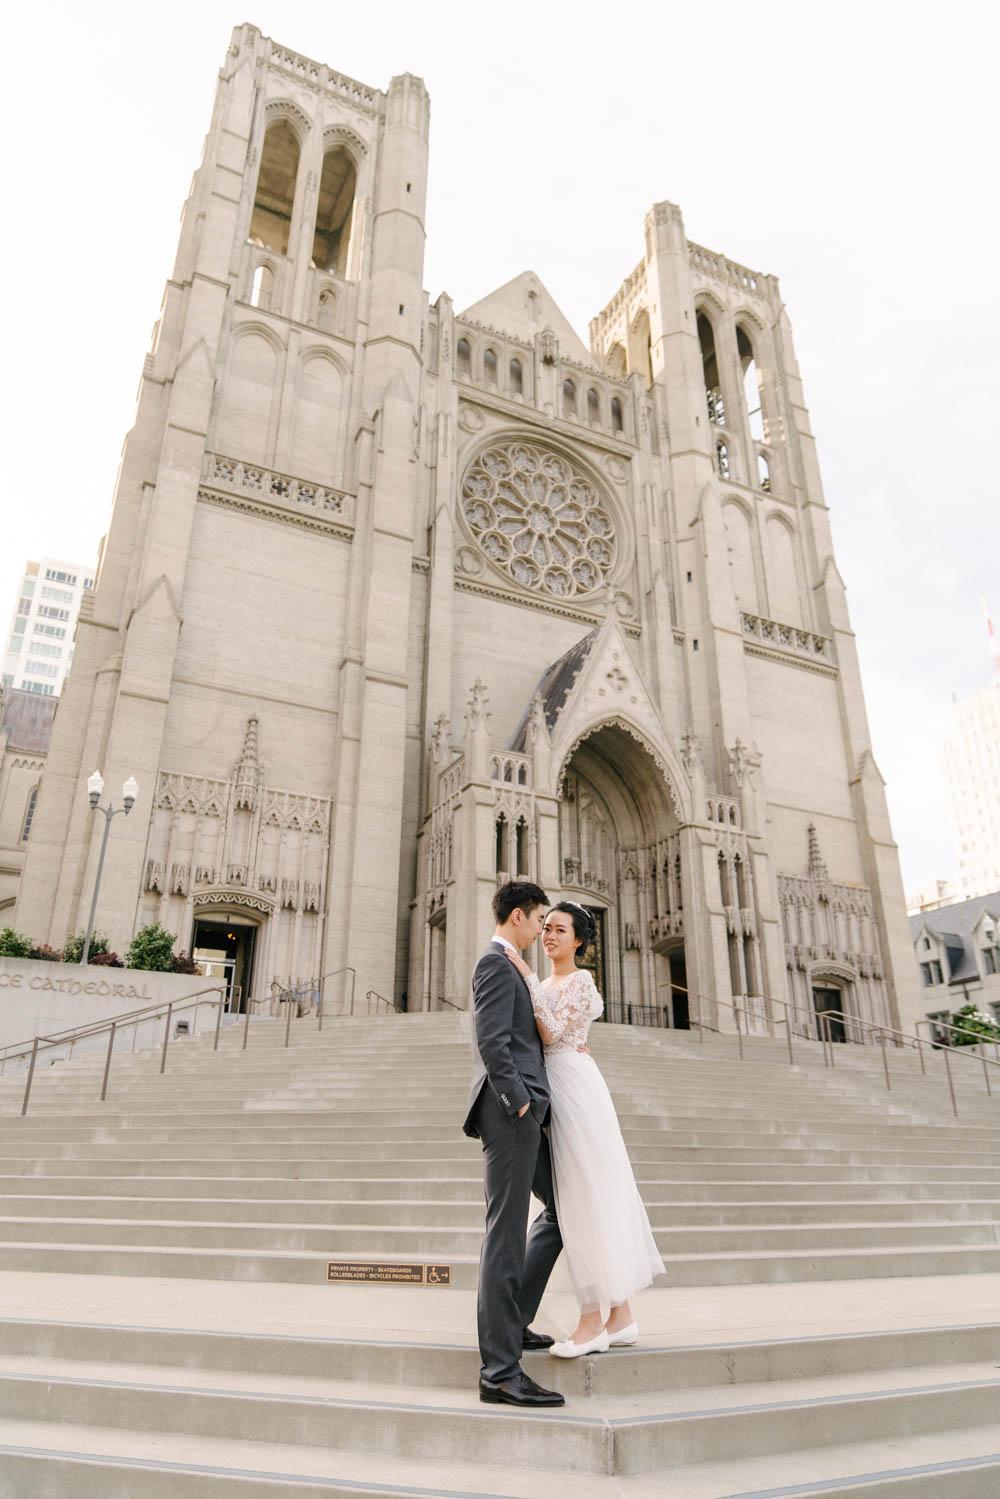 San Francisco Wedding Photographer - City Hall - Pinnel Photography-03807.jpg